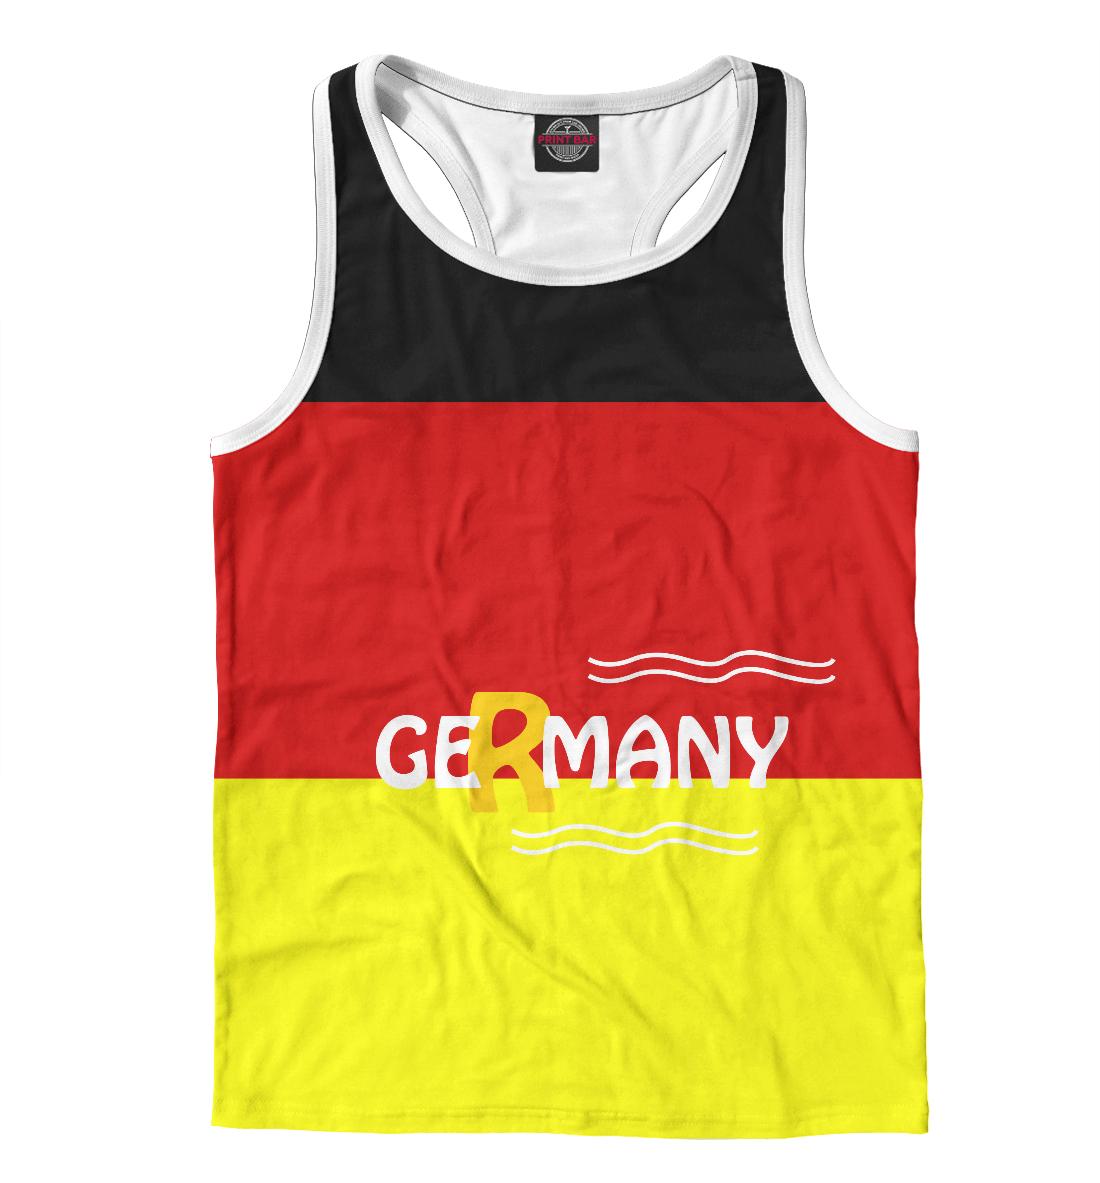 Купить Германия, Printbar, Майки борцовки, GER-199229-mayb-2